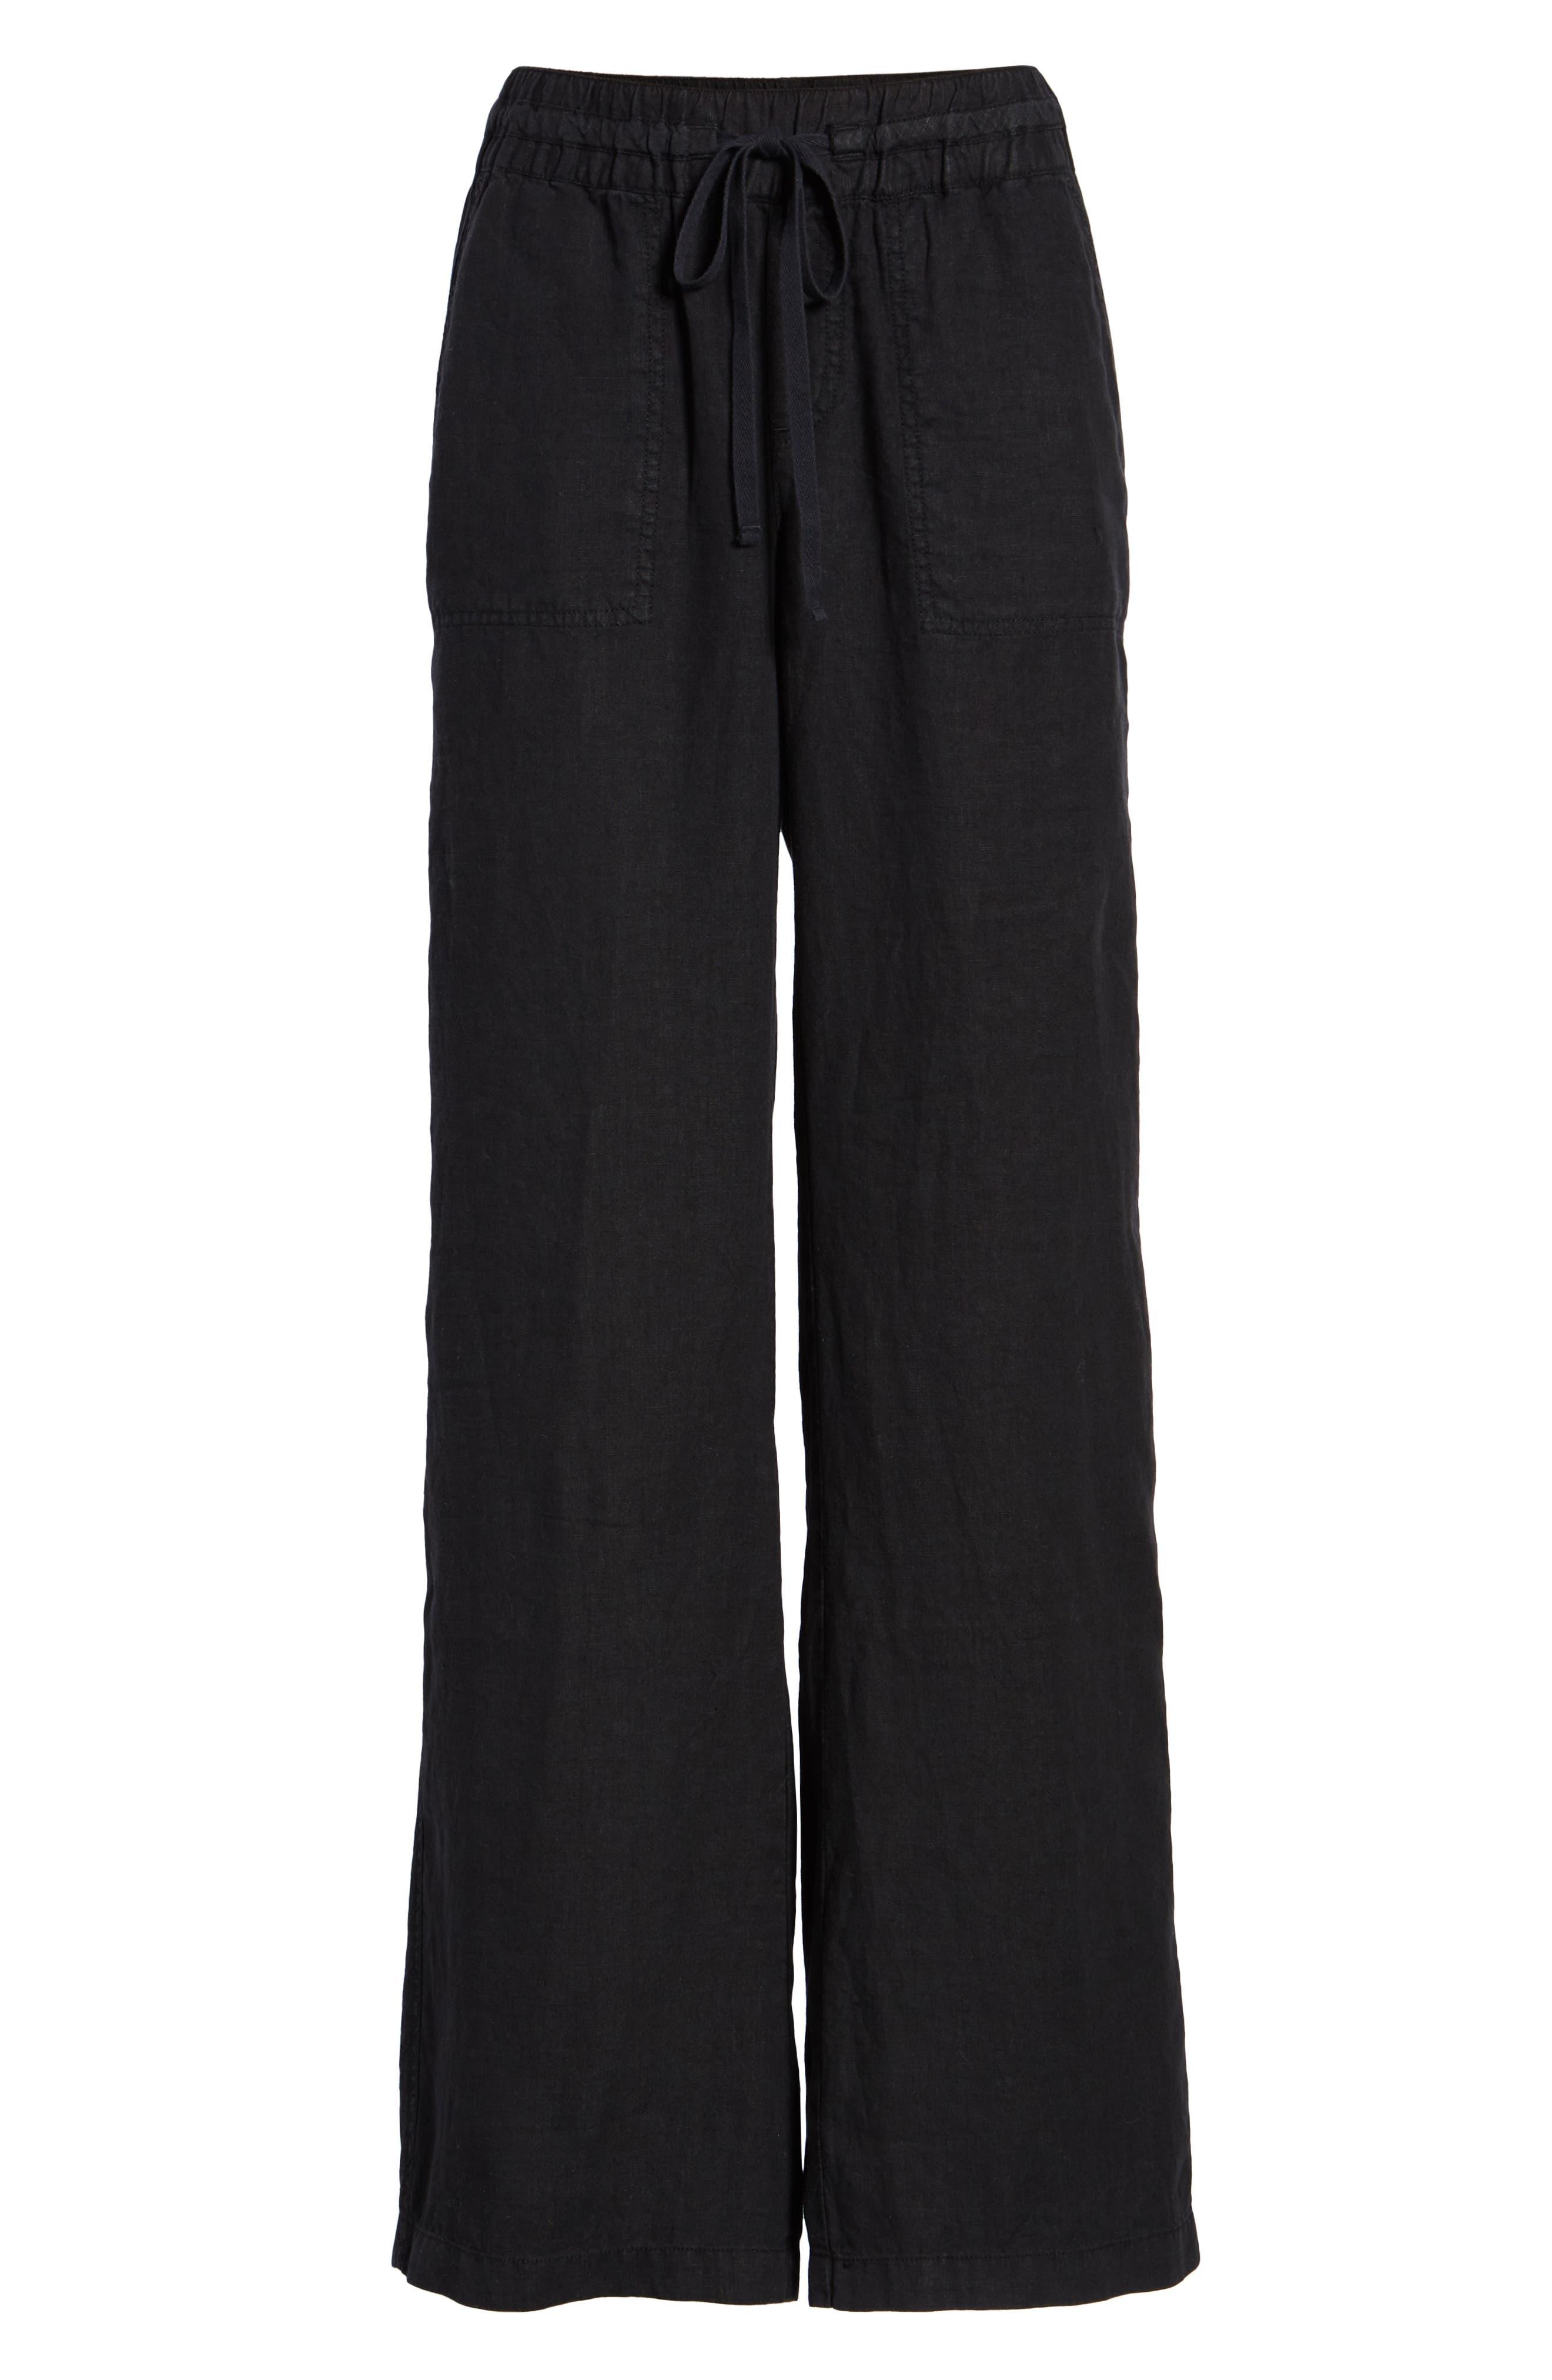 Linen Pants,                             Alternate thumbnail 7, color,                             BLACK